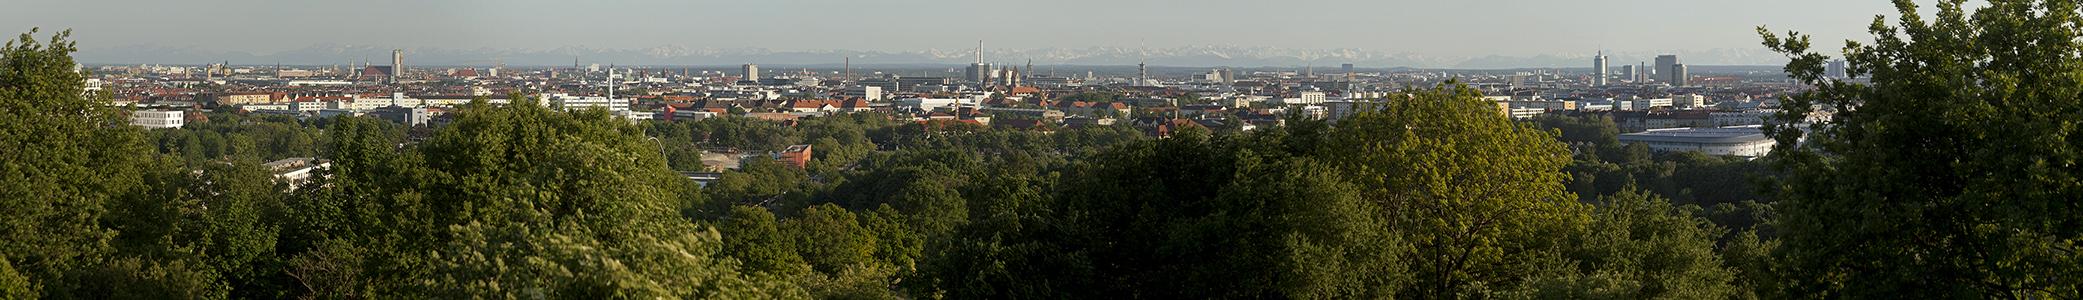 Blick vom Olympiaberg München